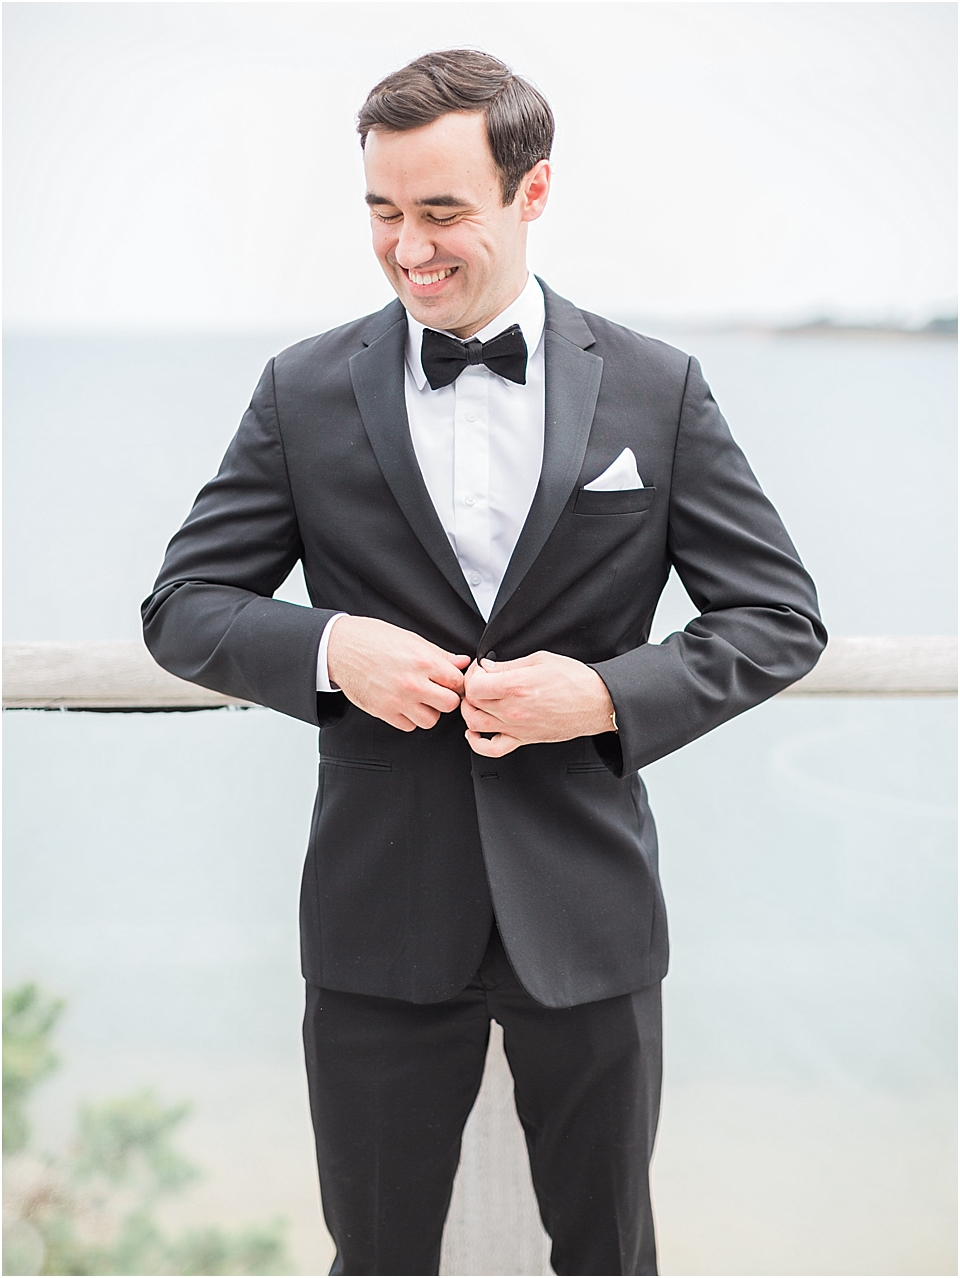 wequassett-boston-cape-cod-wedding-photographer-photo-52-6